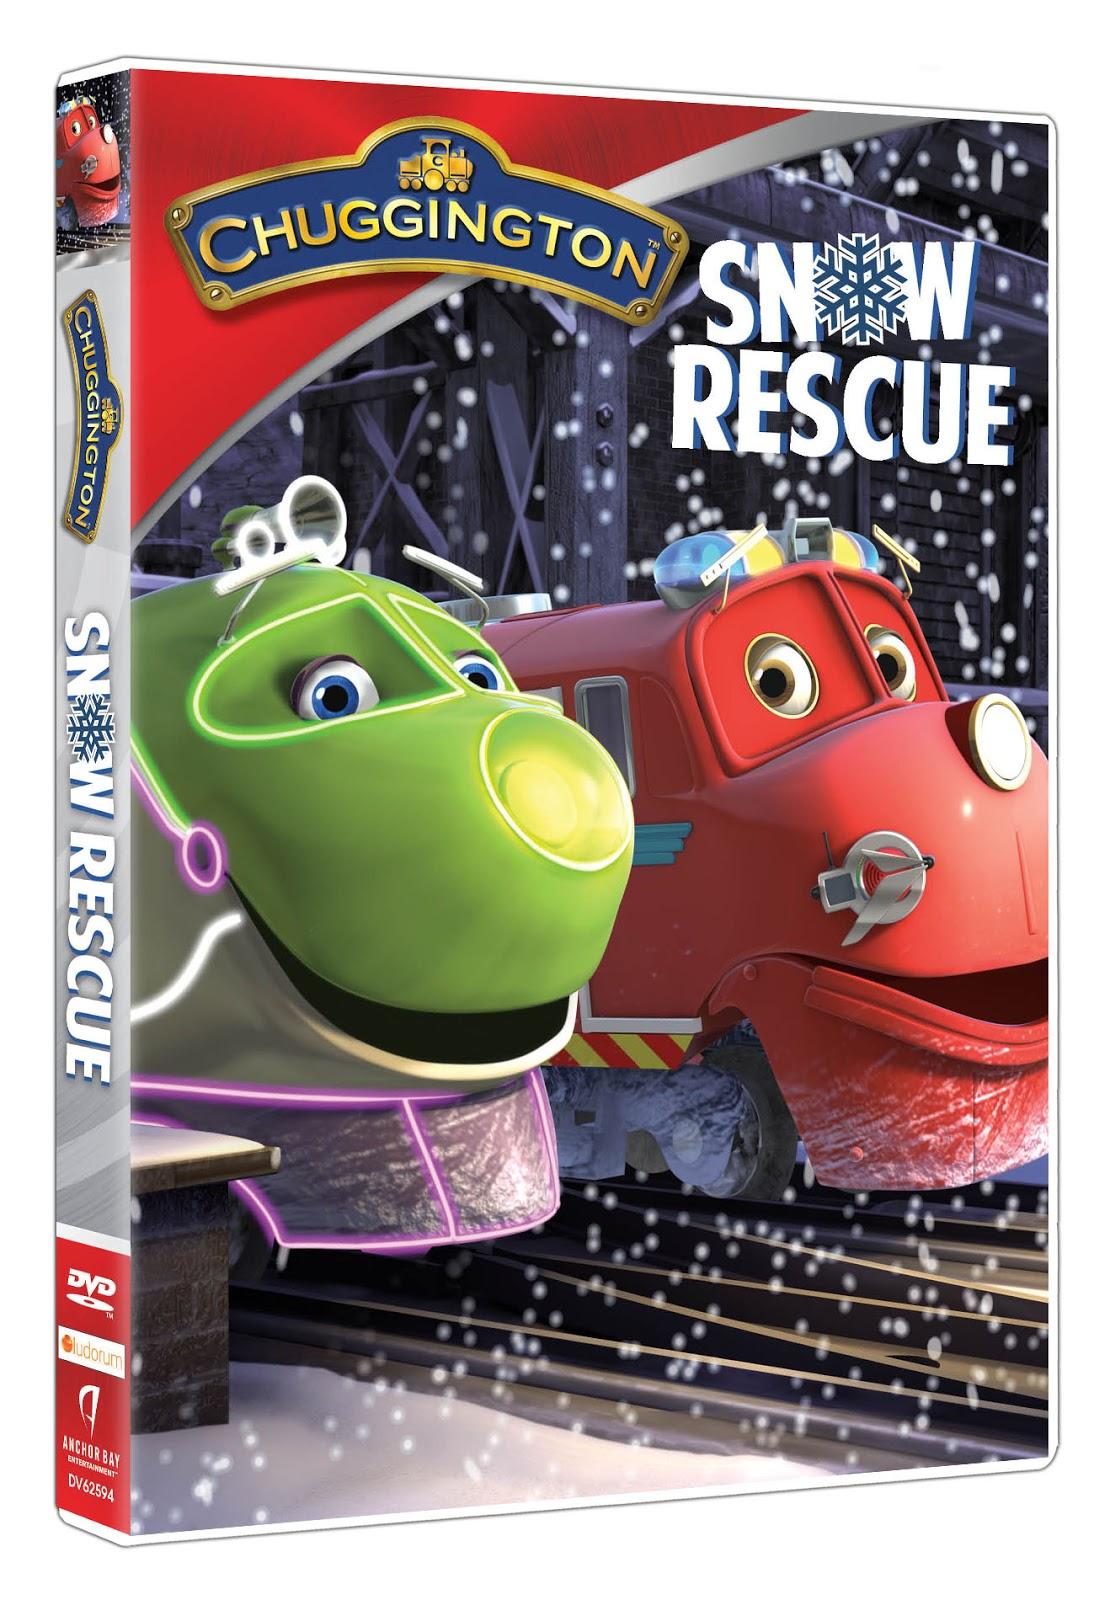 Chuggington: Snow Rescue Rolls Onto DVD This Holiday Season - A New ...